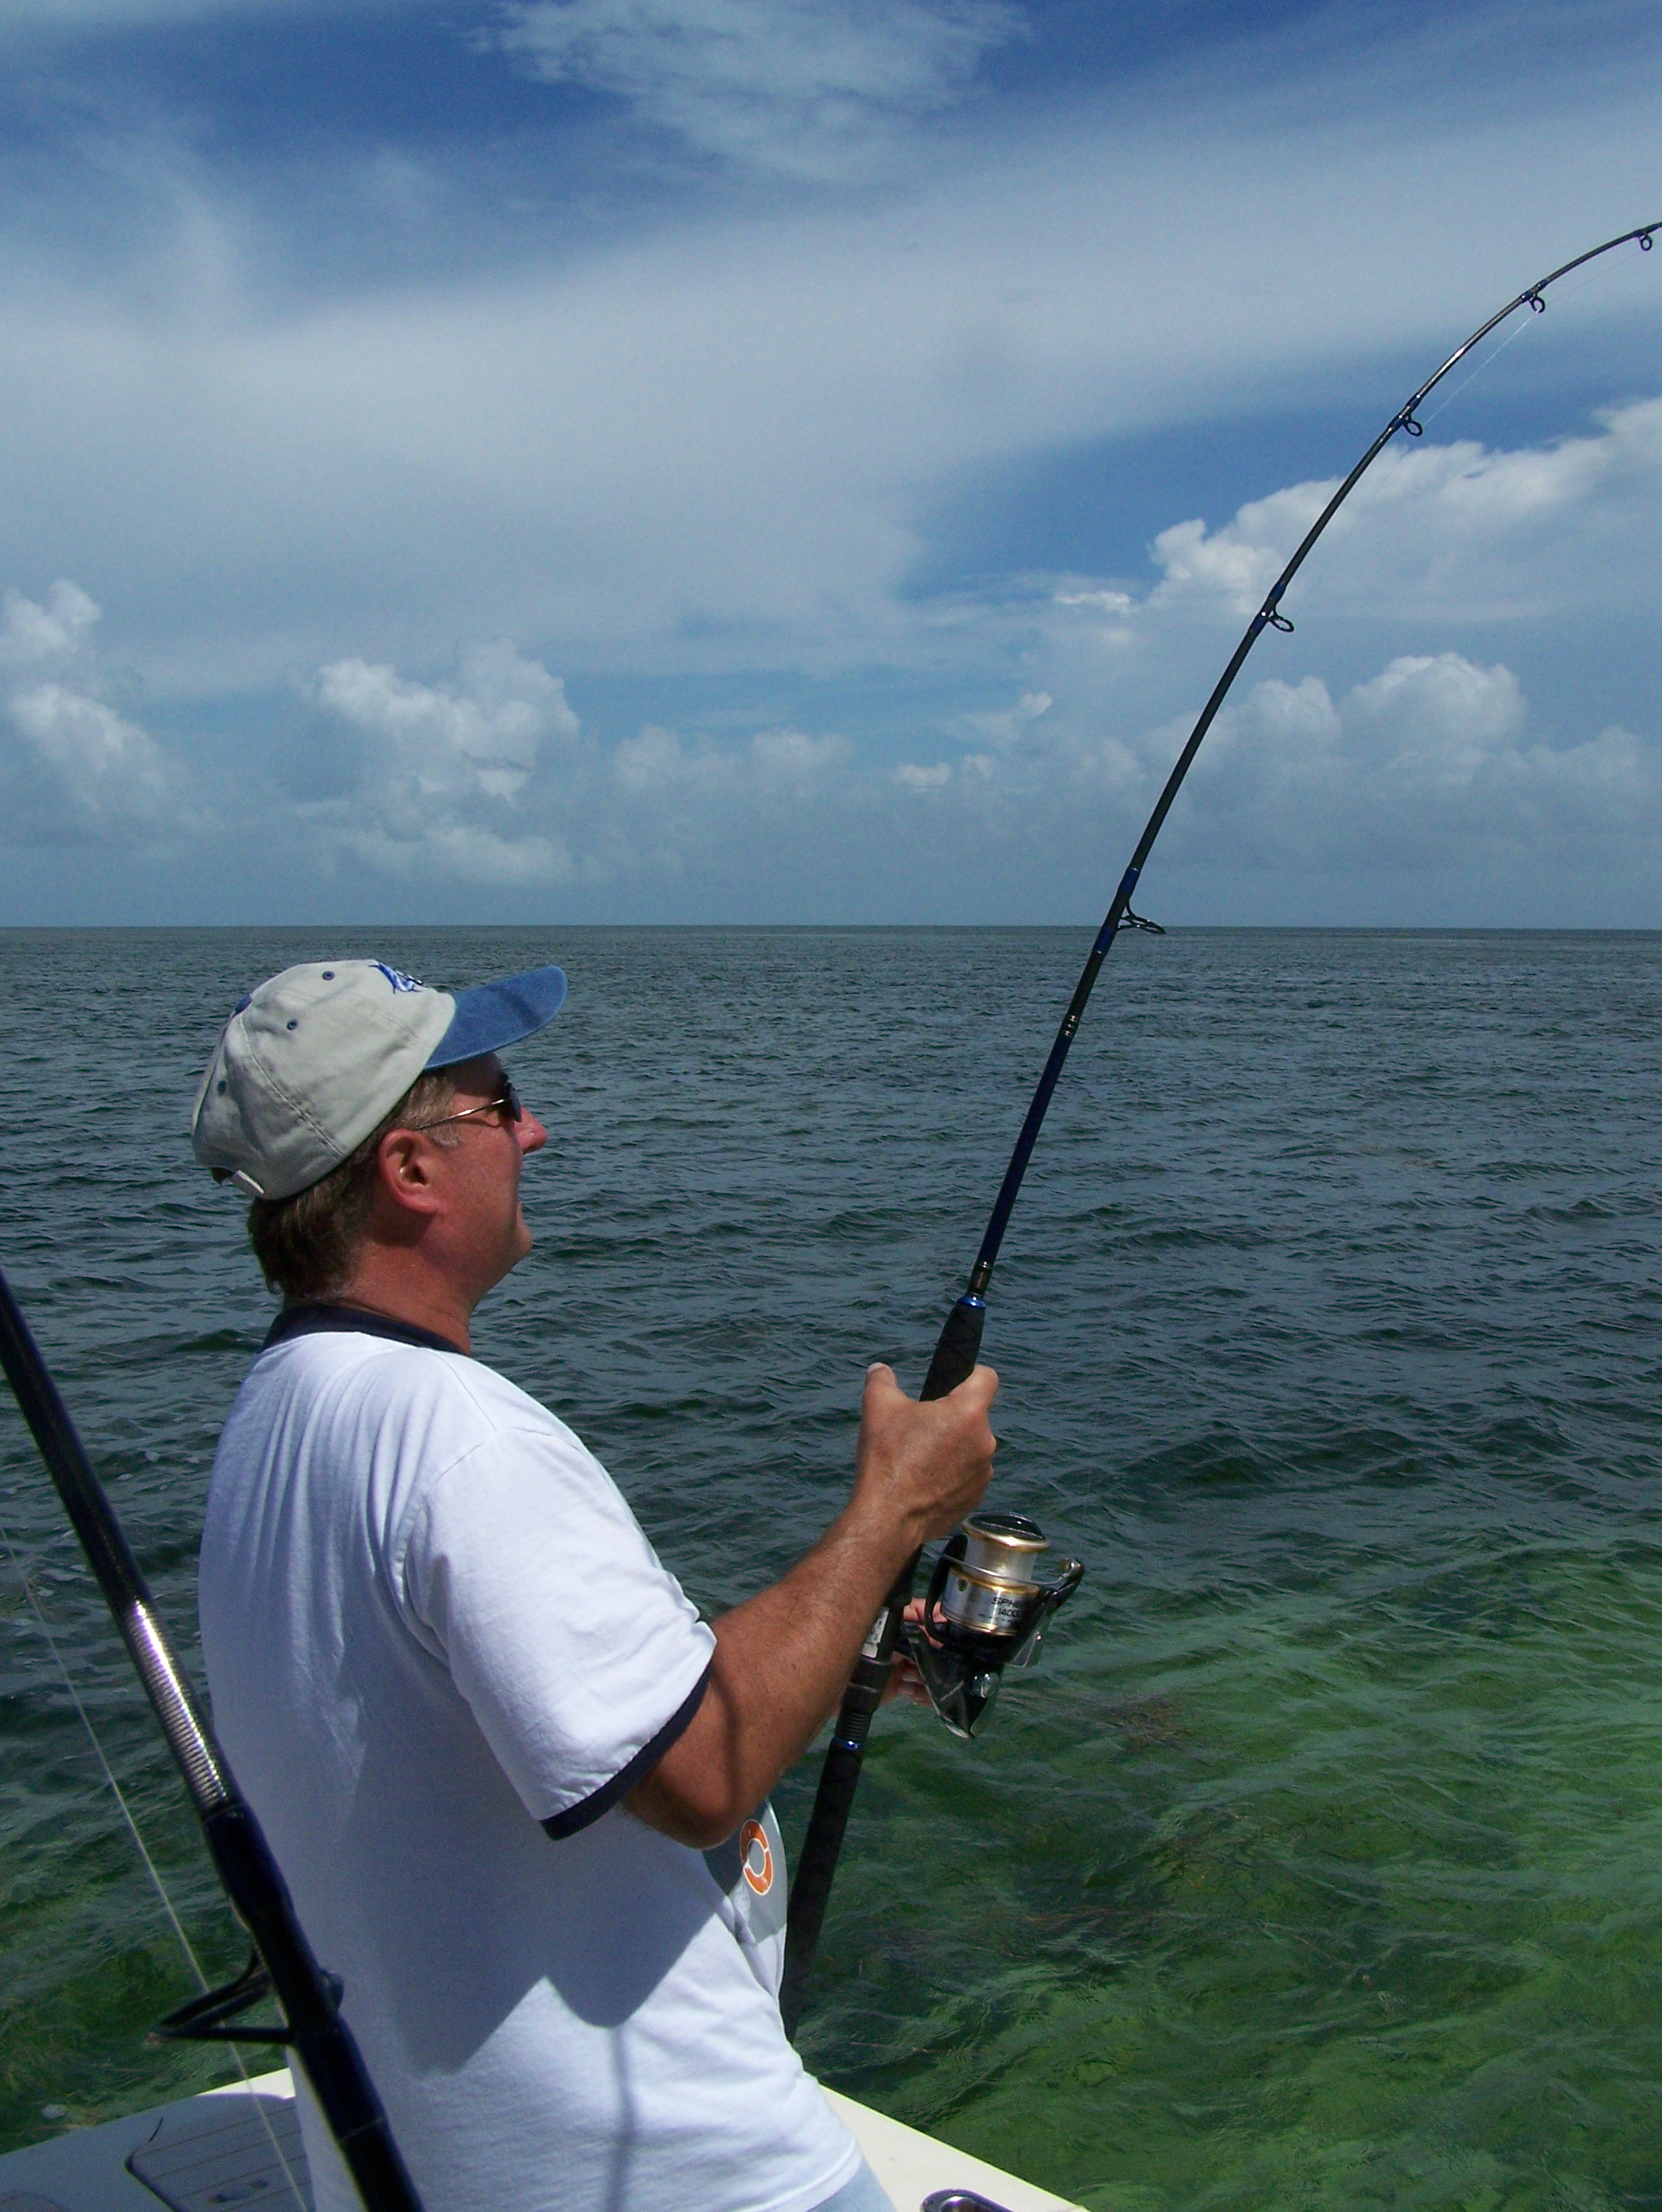 Florida keys grouper fishing seasquared charters part 6 for Florida keys fishing